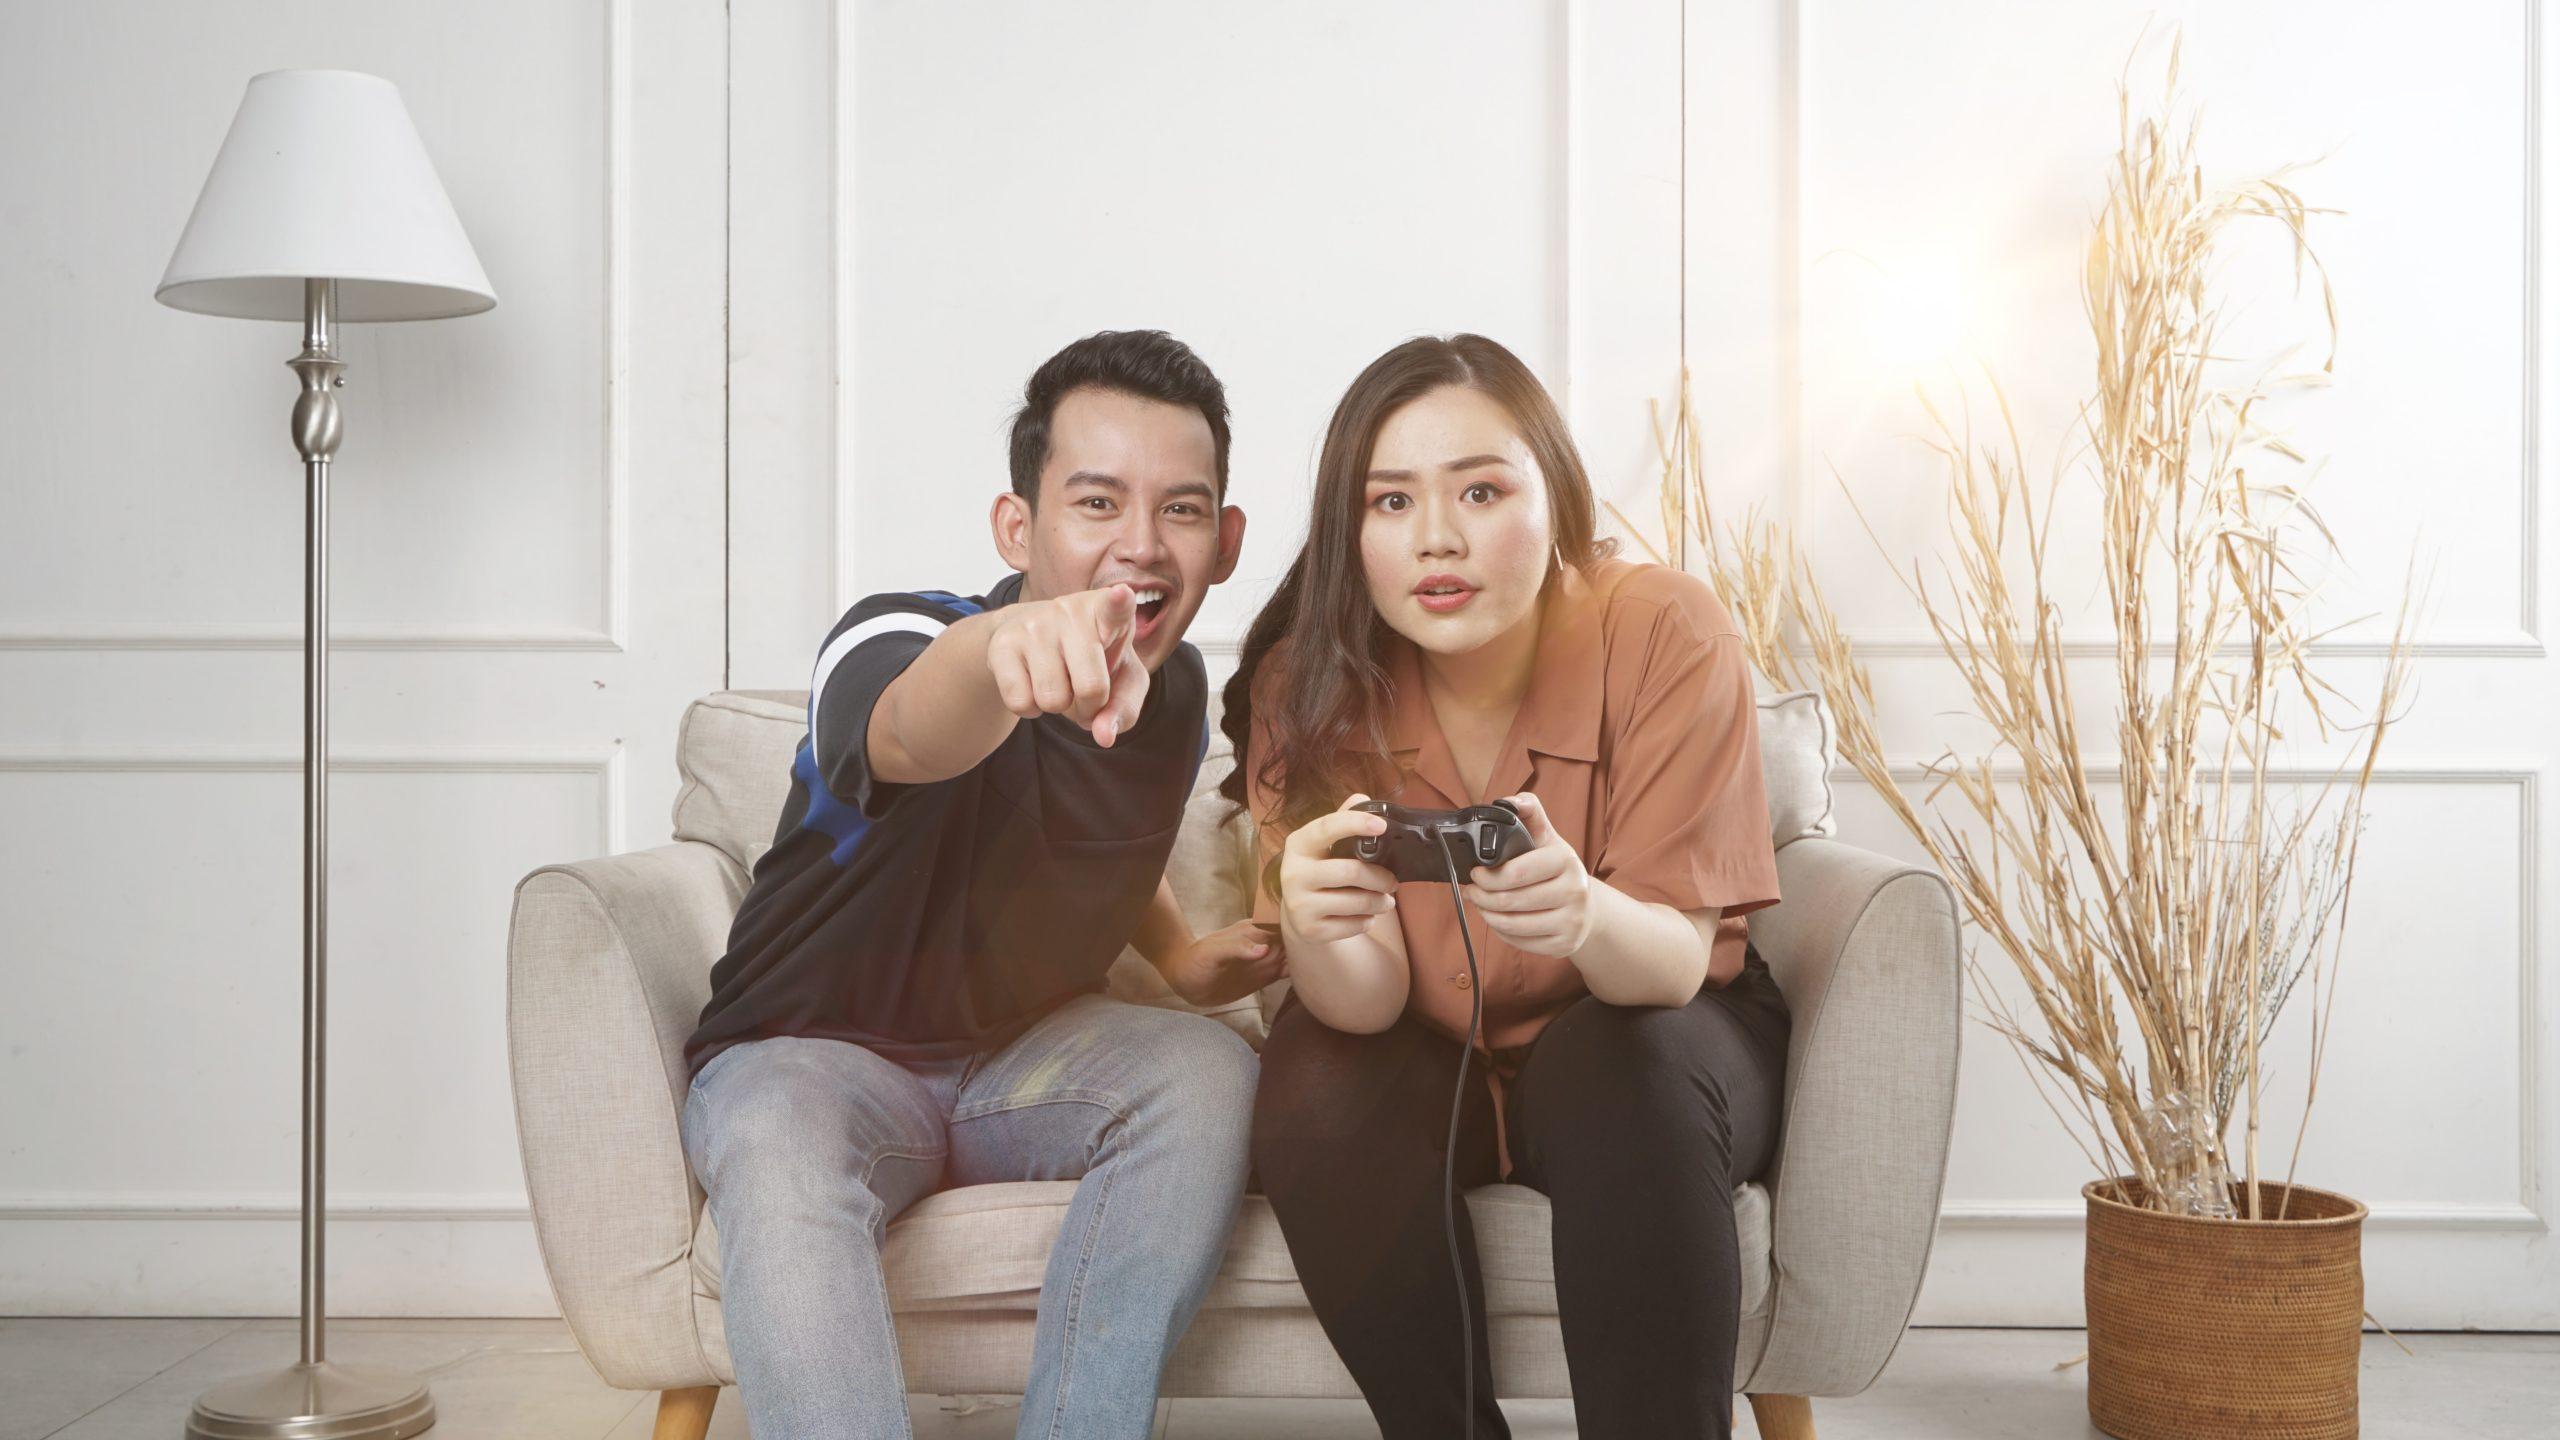 5 Fun Creative Game Night Ideas To Do At Home